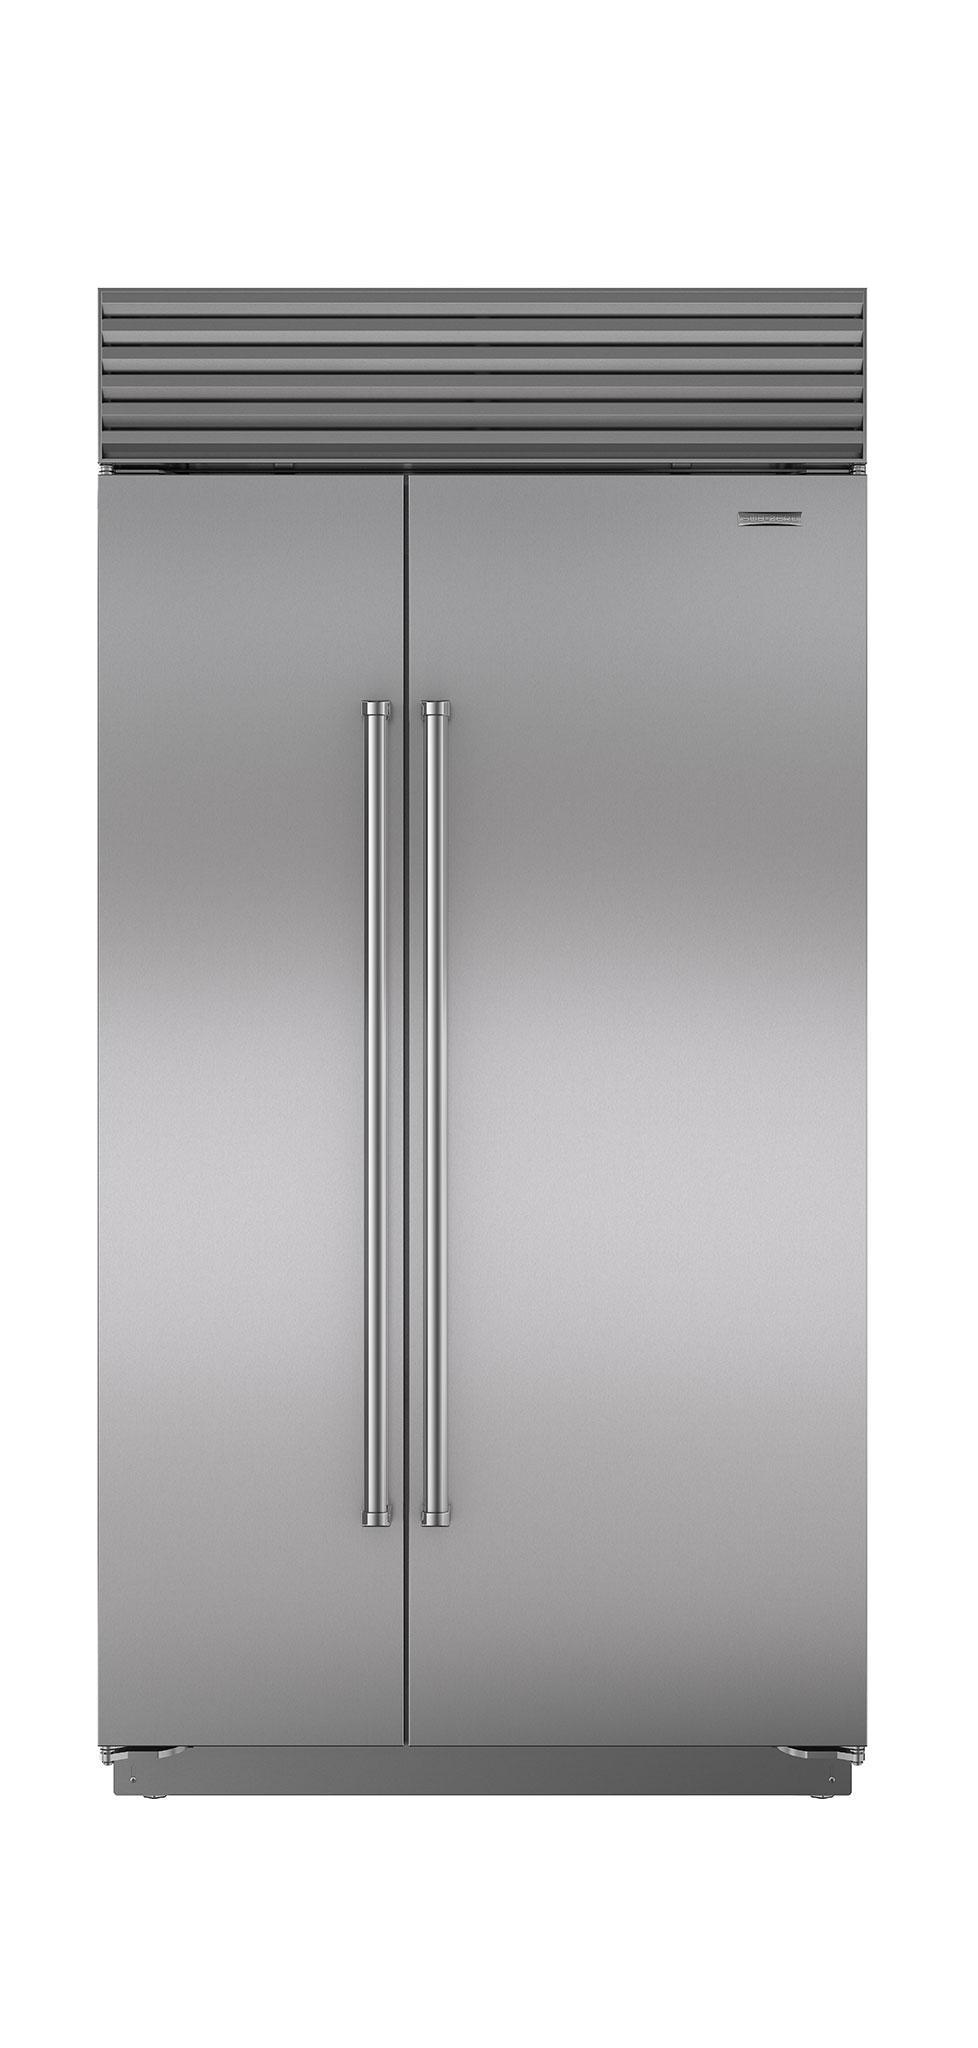 Sub Zero Model Bi42ssph Caplan S Appliances